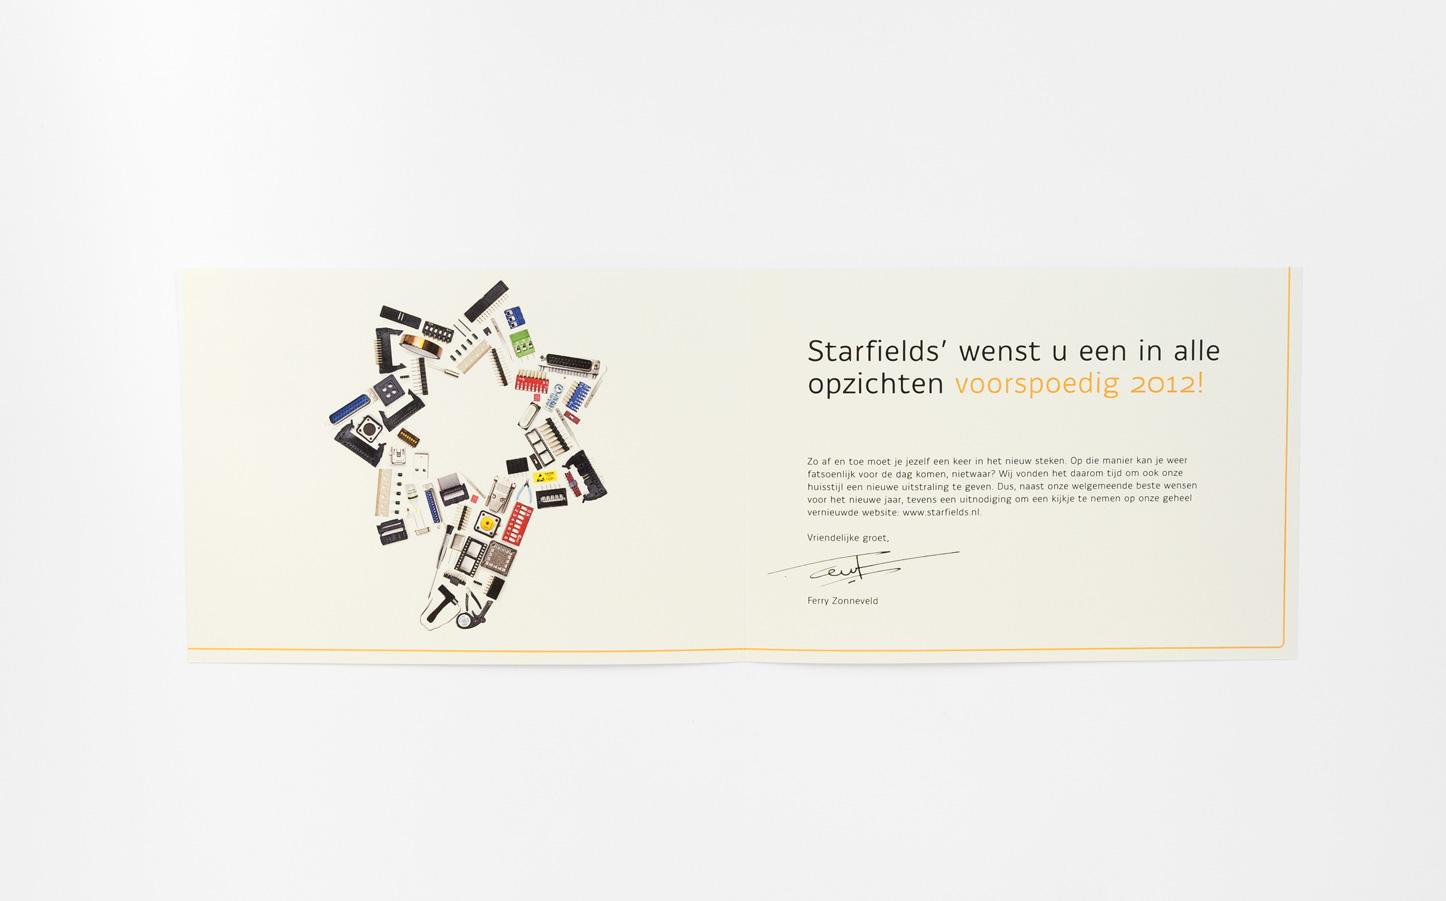 Starfields', nieuwjaarskaart